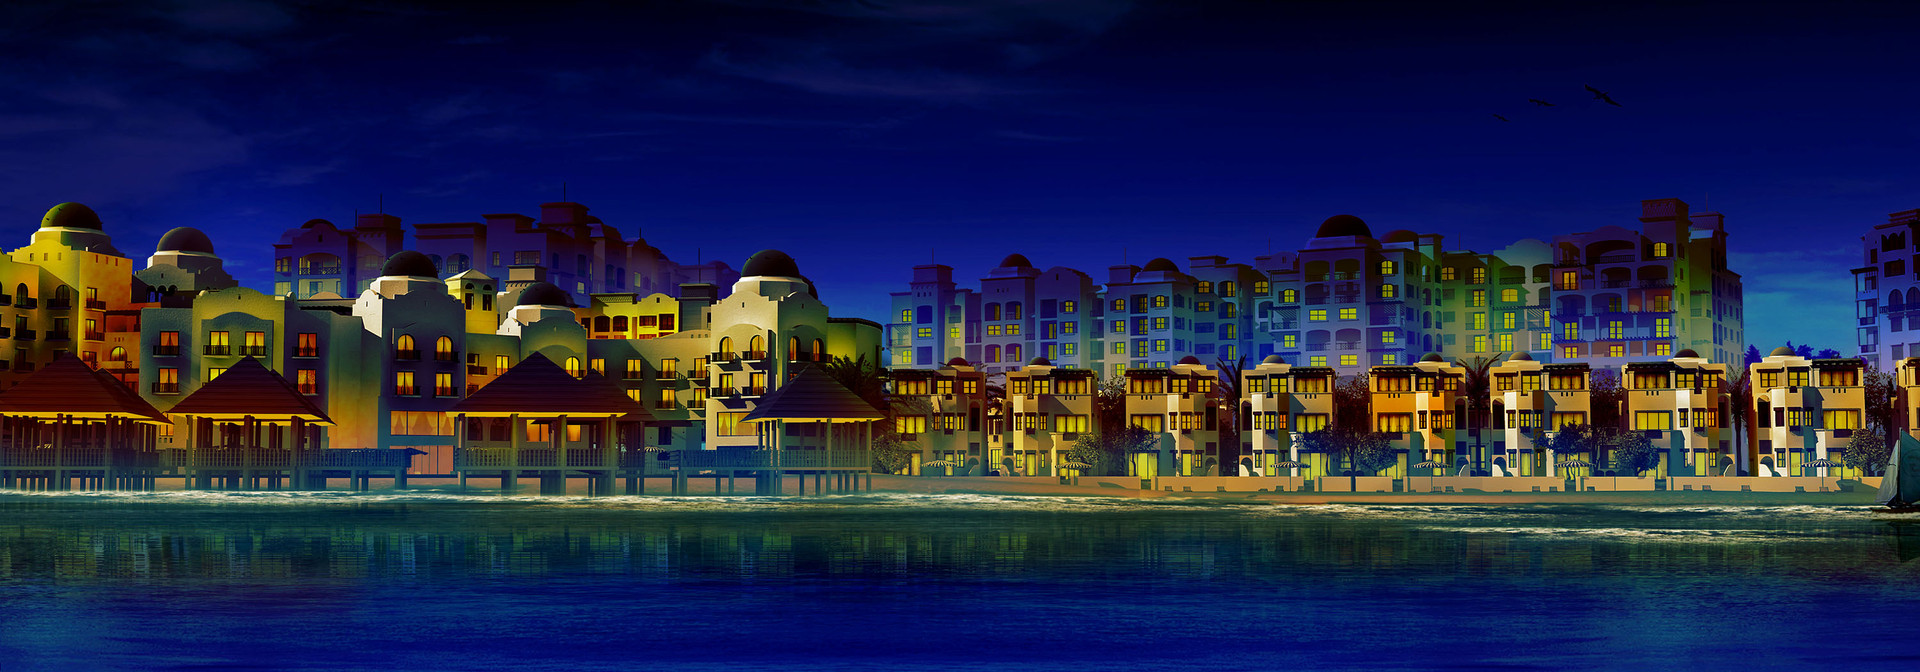 Sea_Night_Cam2_Hi_Res.jpg